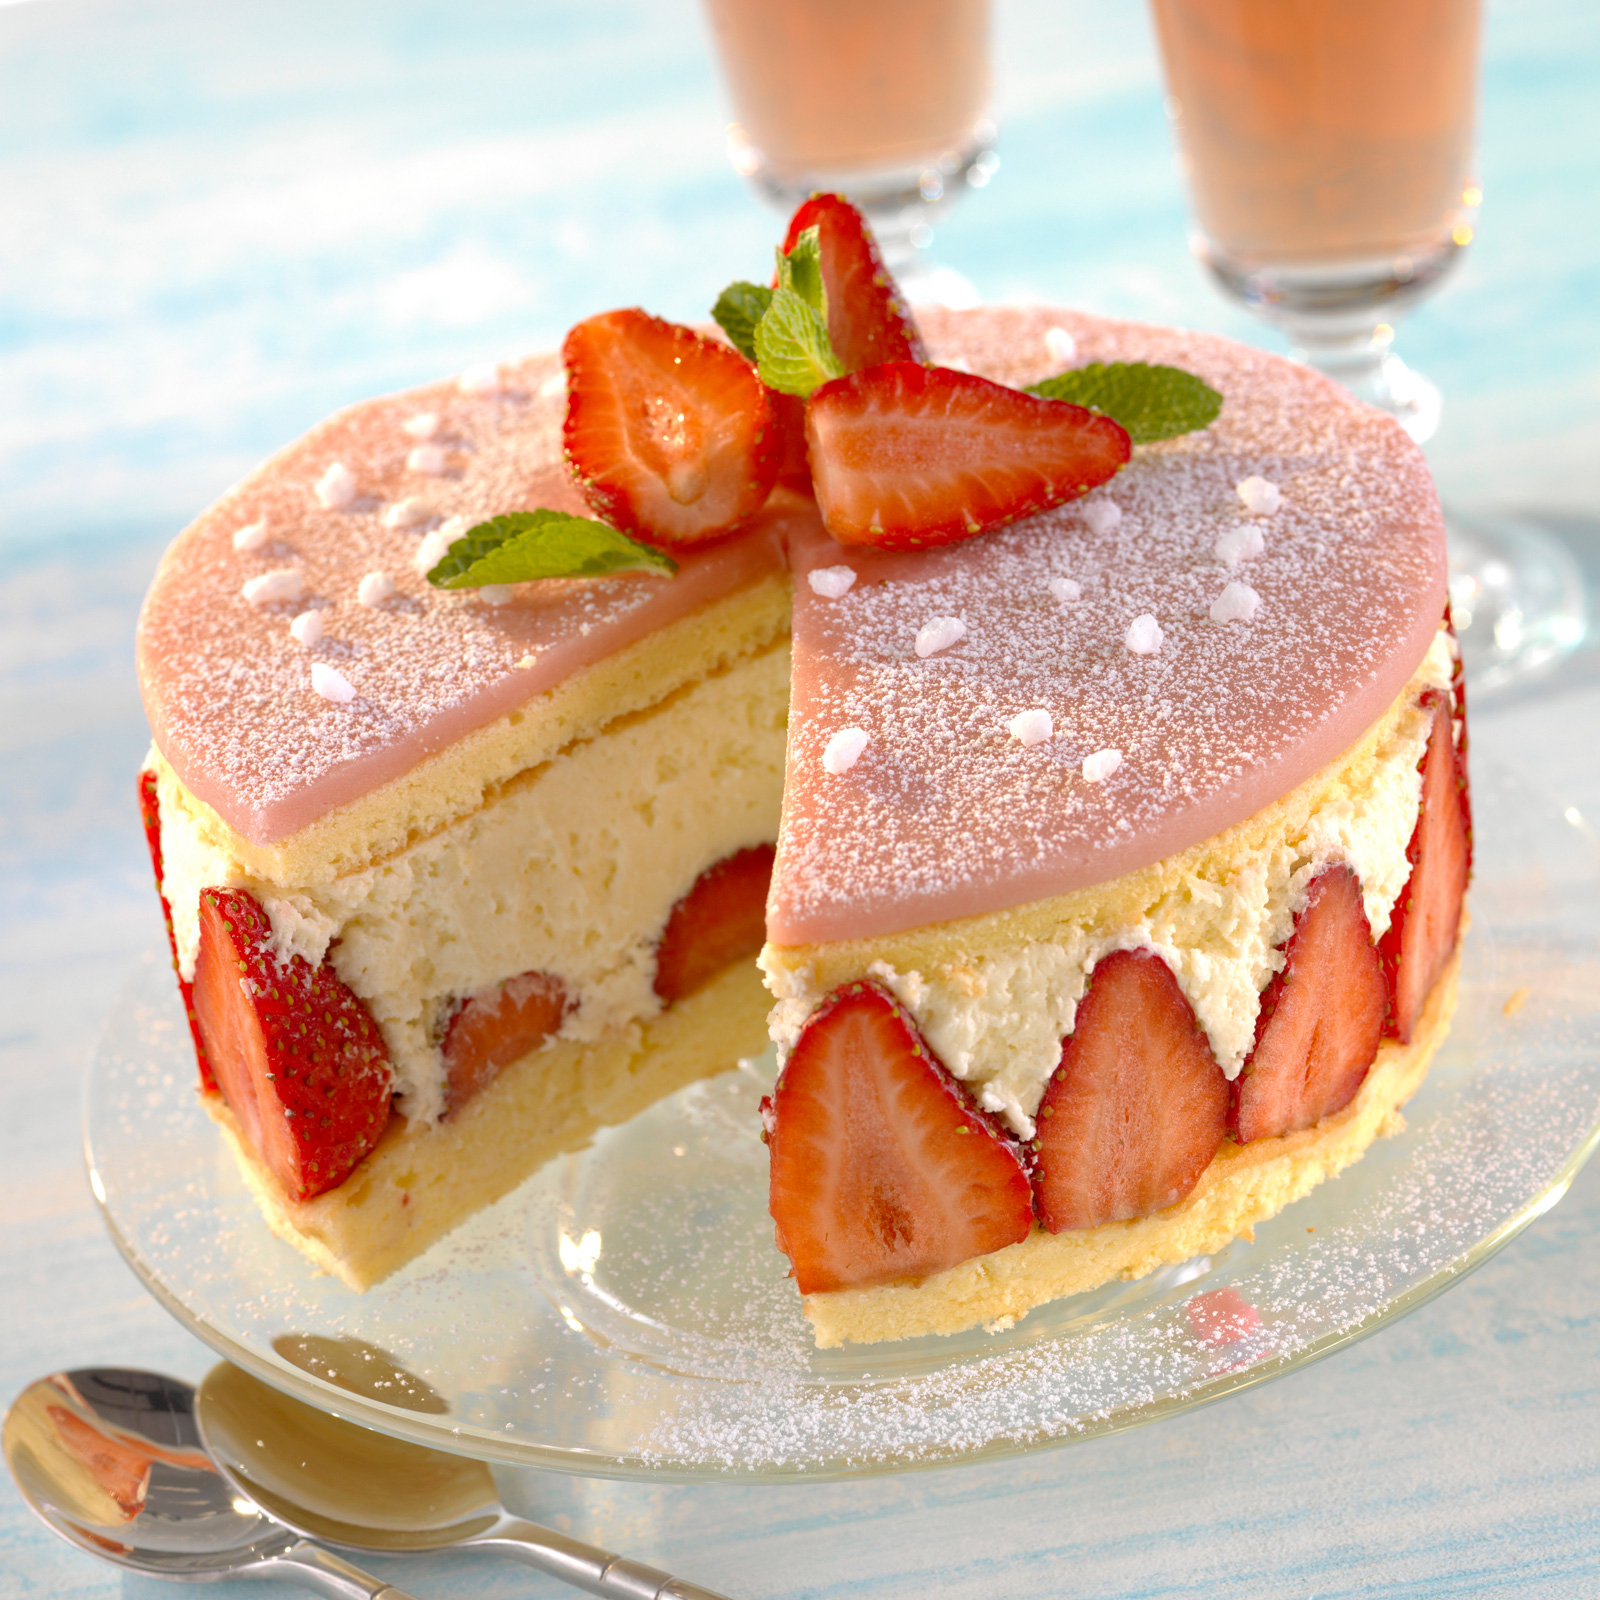 Recette Meilleur Patissier Wedding Cake